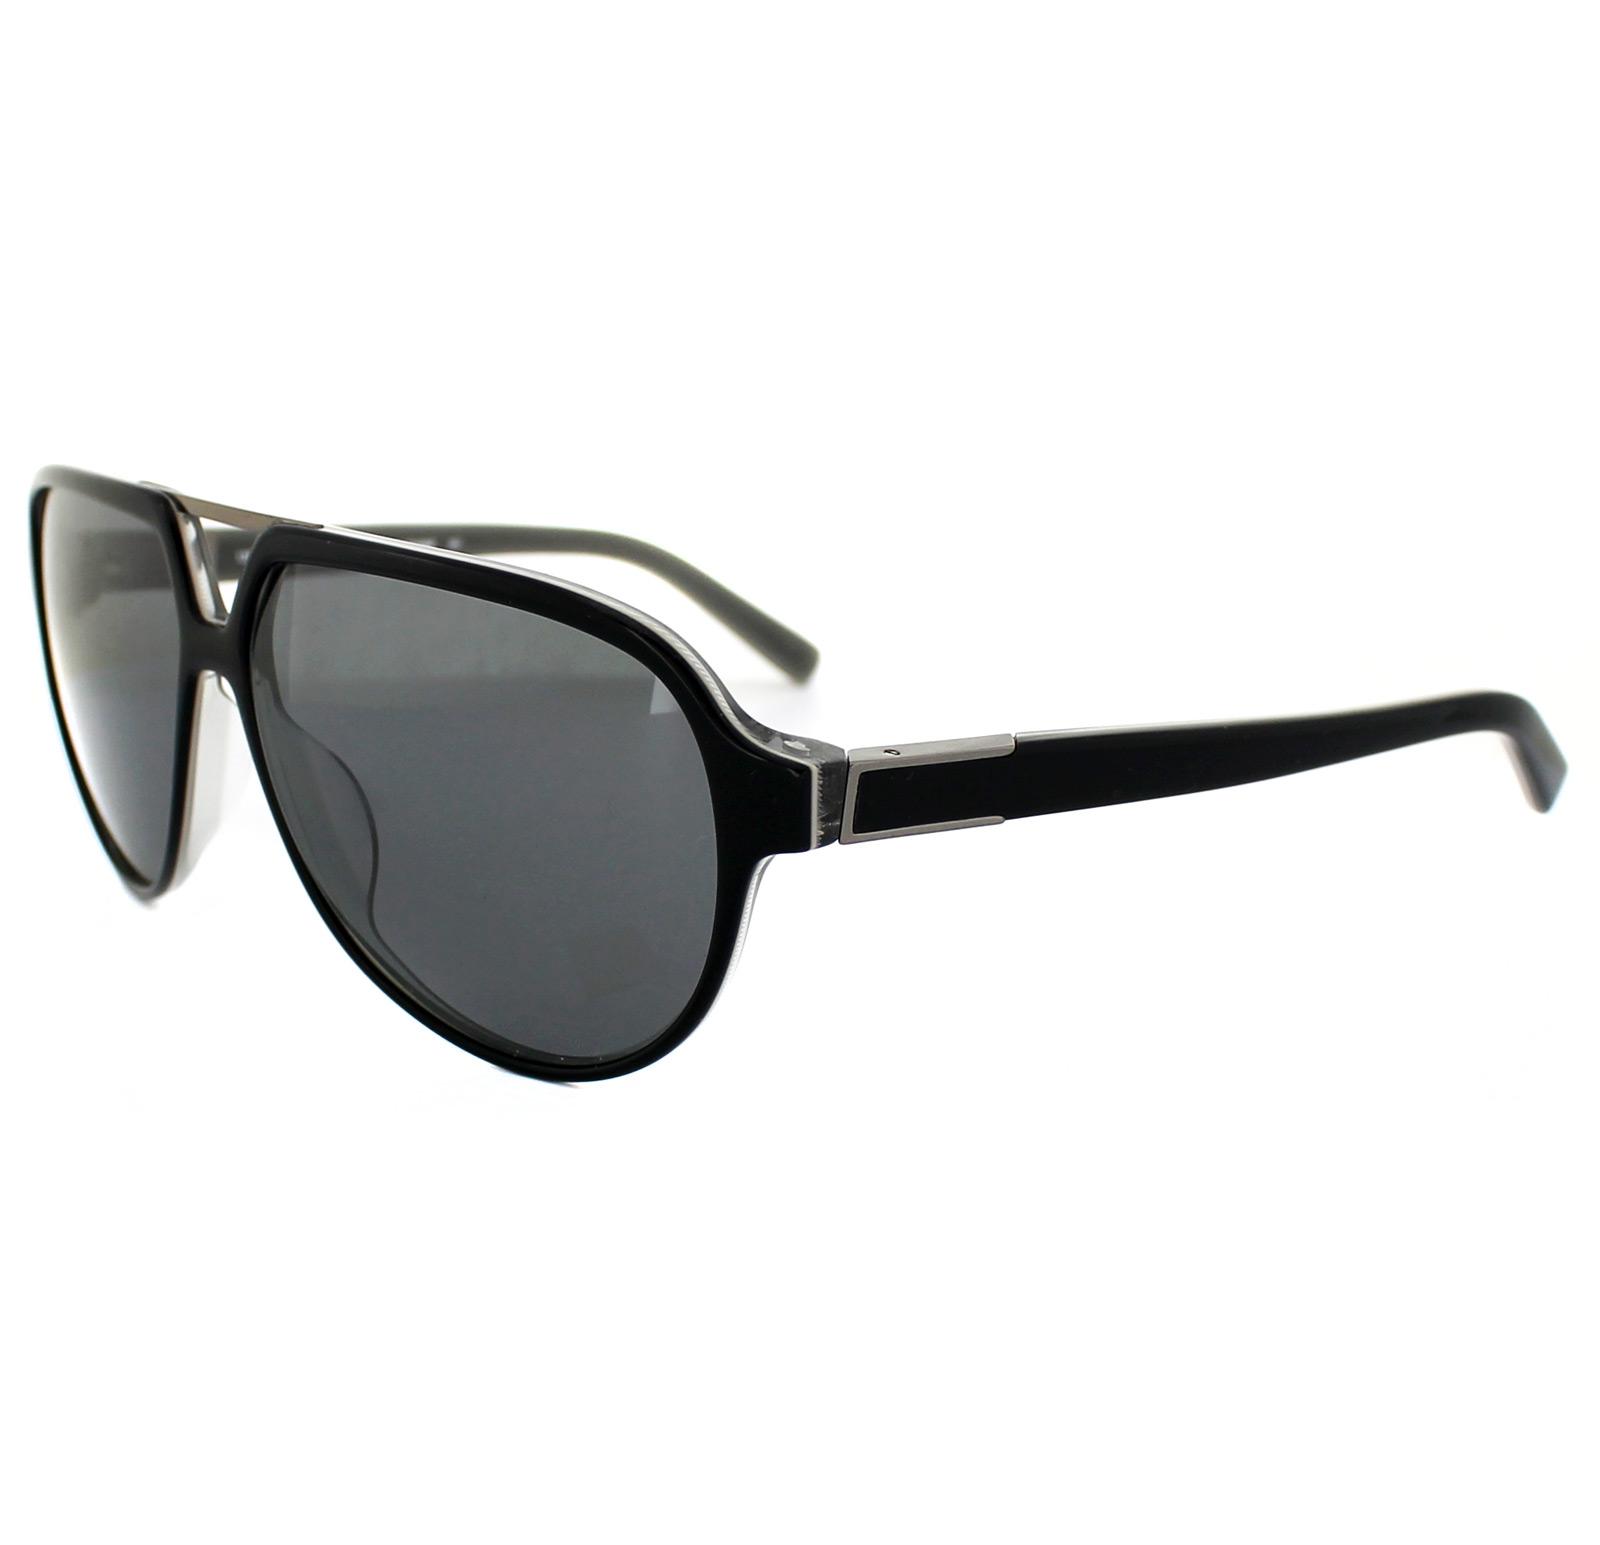 66d13c5f76f4 Cheap Calvin Klein 7858SP Sunglasses - Discounted Sunglasses